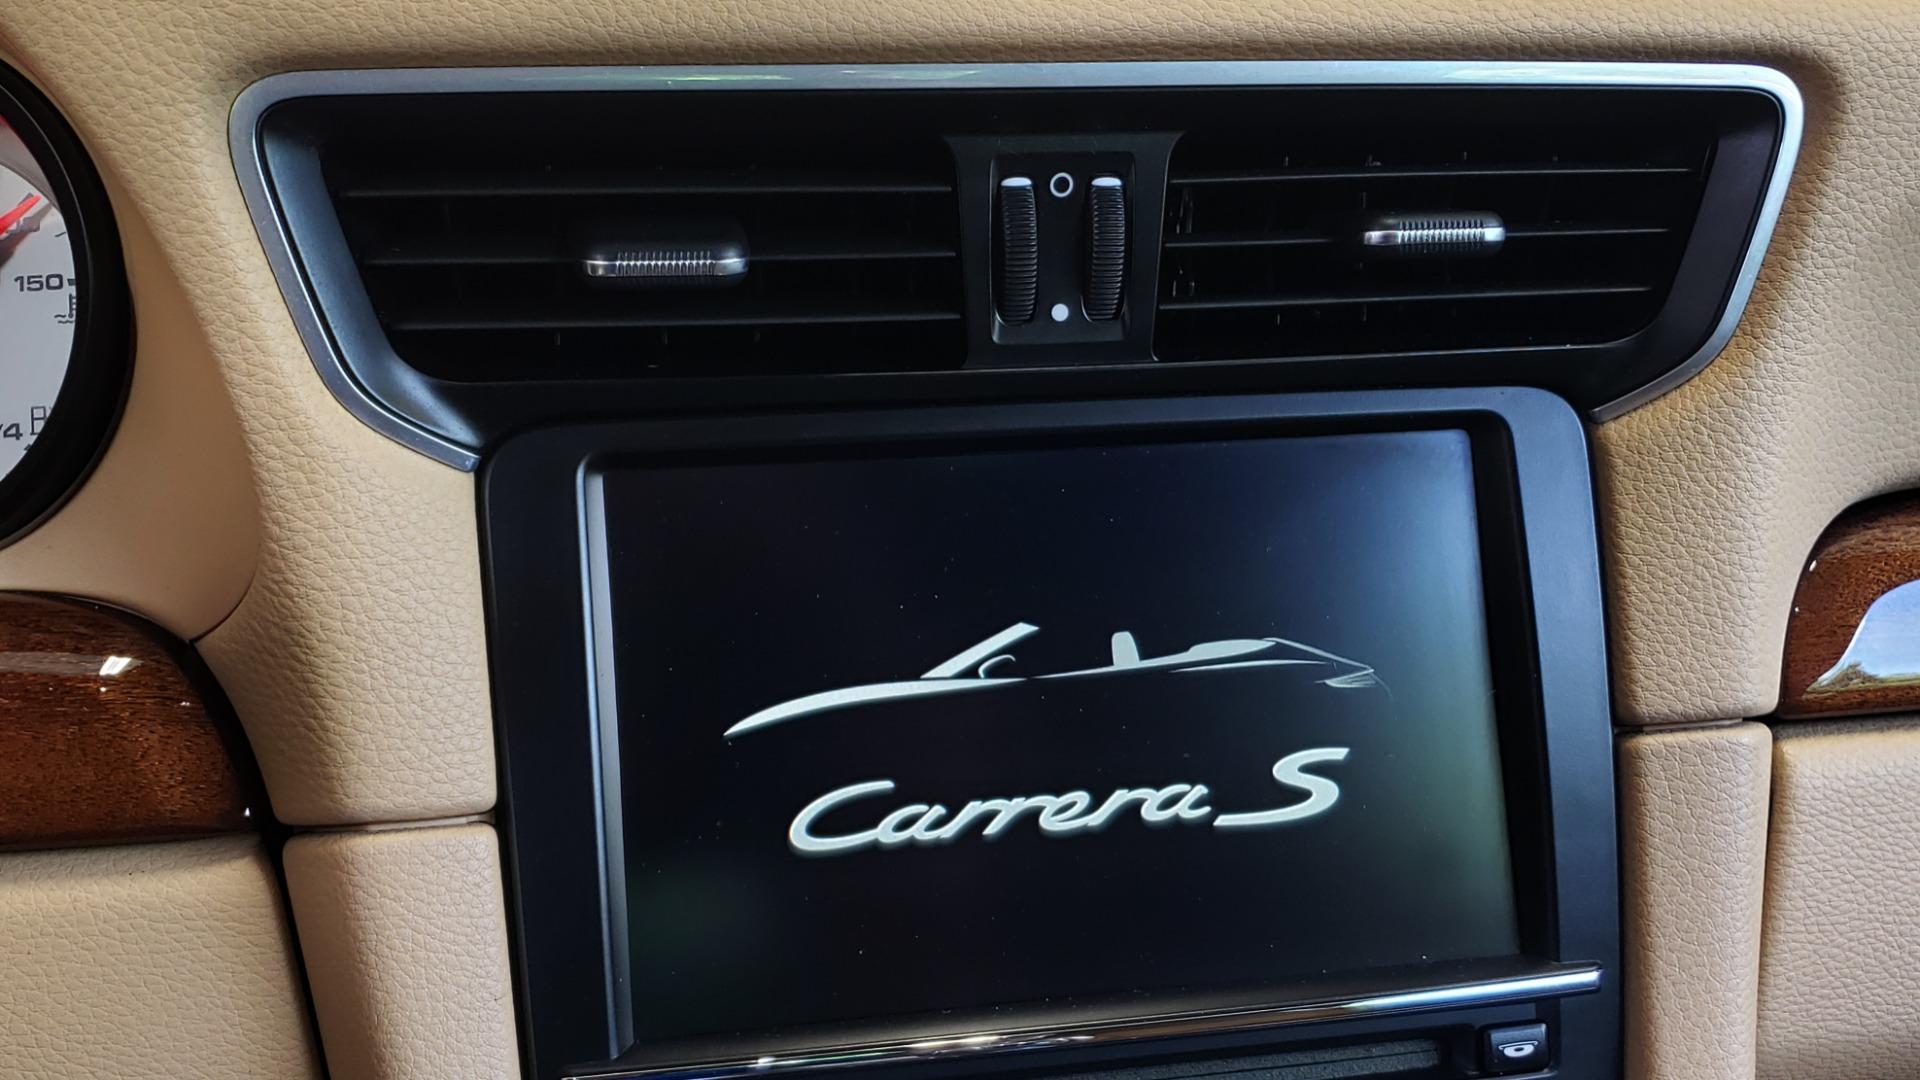 Used 2014 Porsche 911 CARRERA S CABRIOLET / PREM PKG / PDK / NAV / BOSE / SPORT CHRONO for sale $81,995 at Formula Imports in Charlotte NC 28227 31